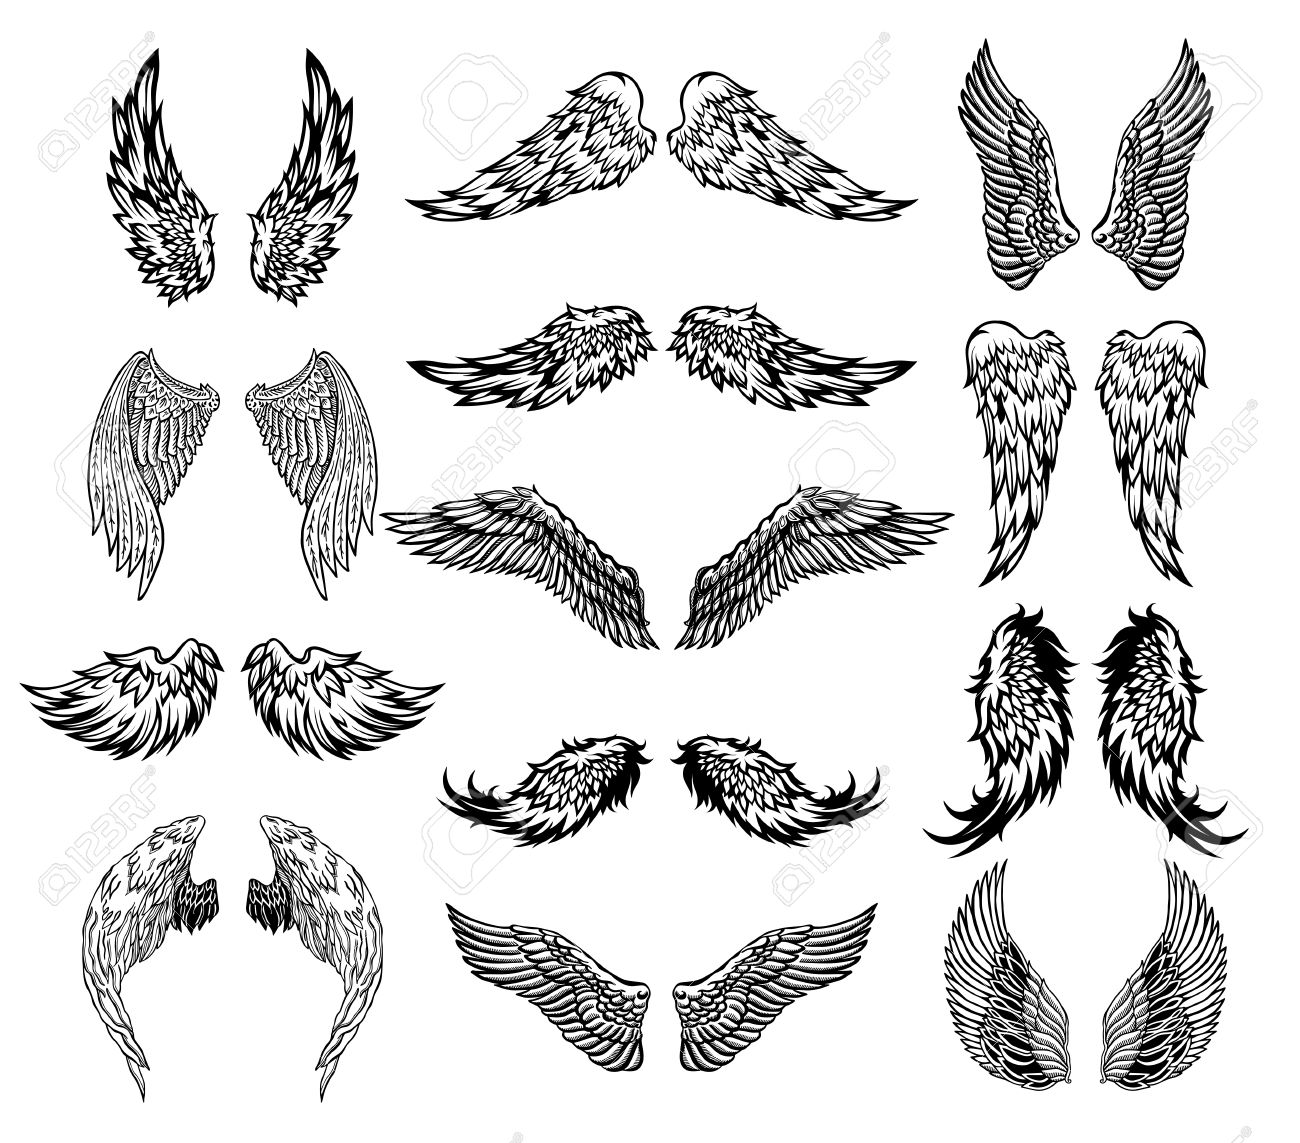 Flügel Tattoo Set Lizenzfrei Nutzbare Vektorgrafiken Clip Arts